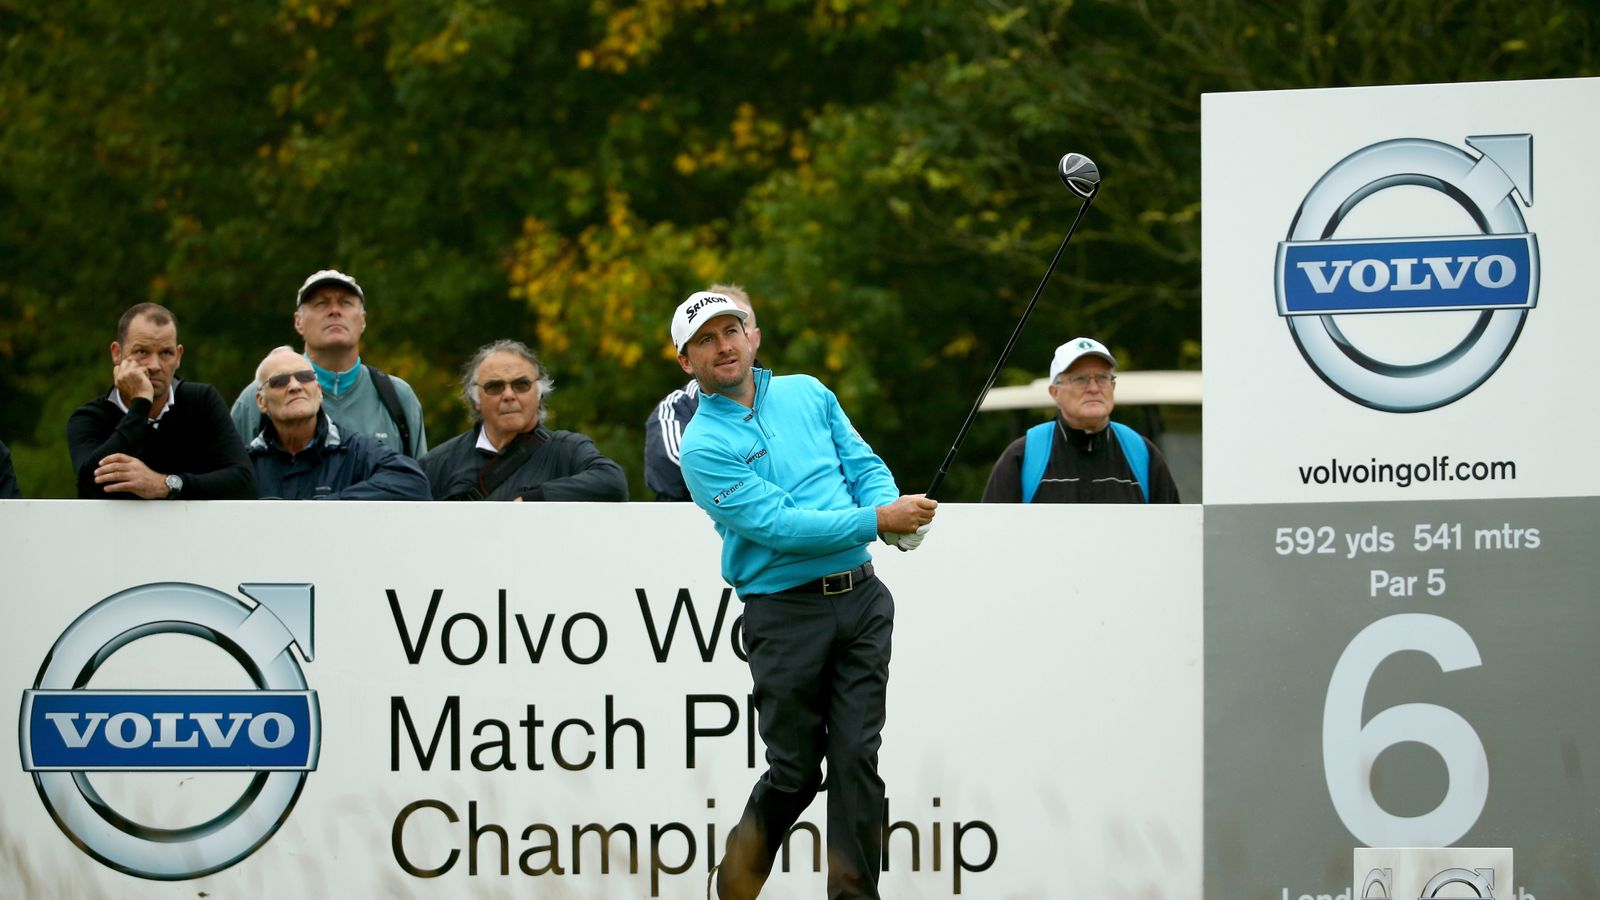 Volvo world match play golf 2021 betting odds sports betting broker